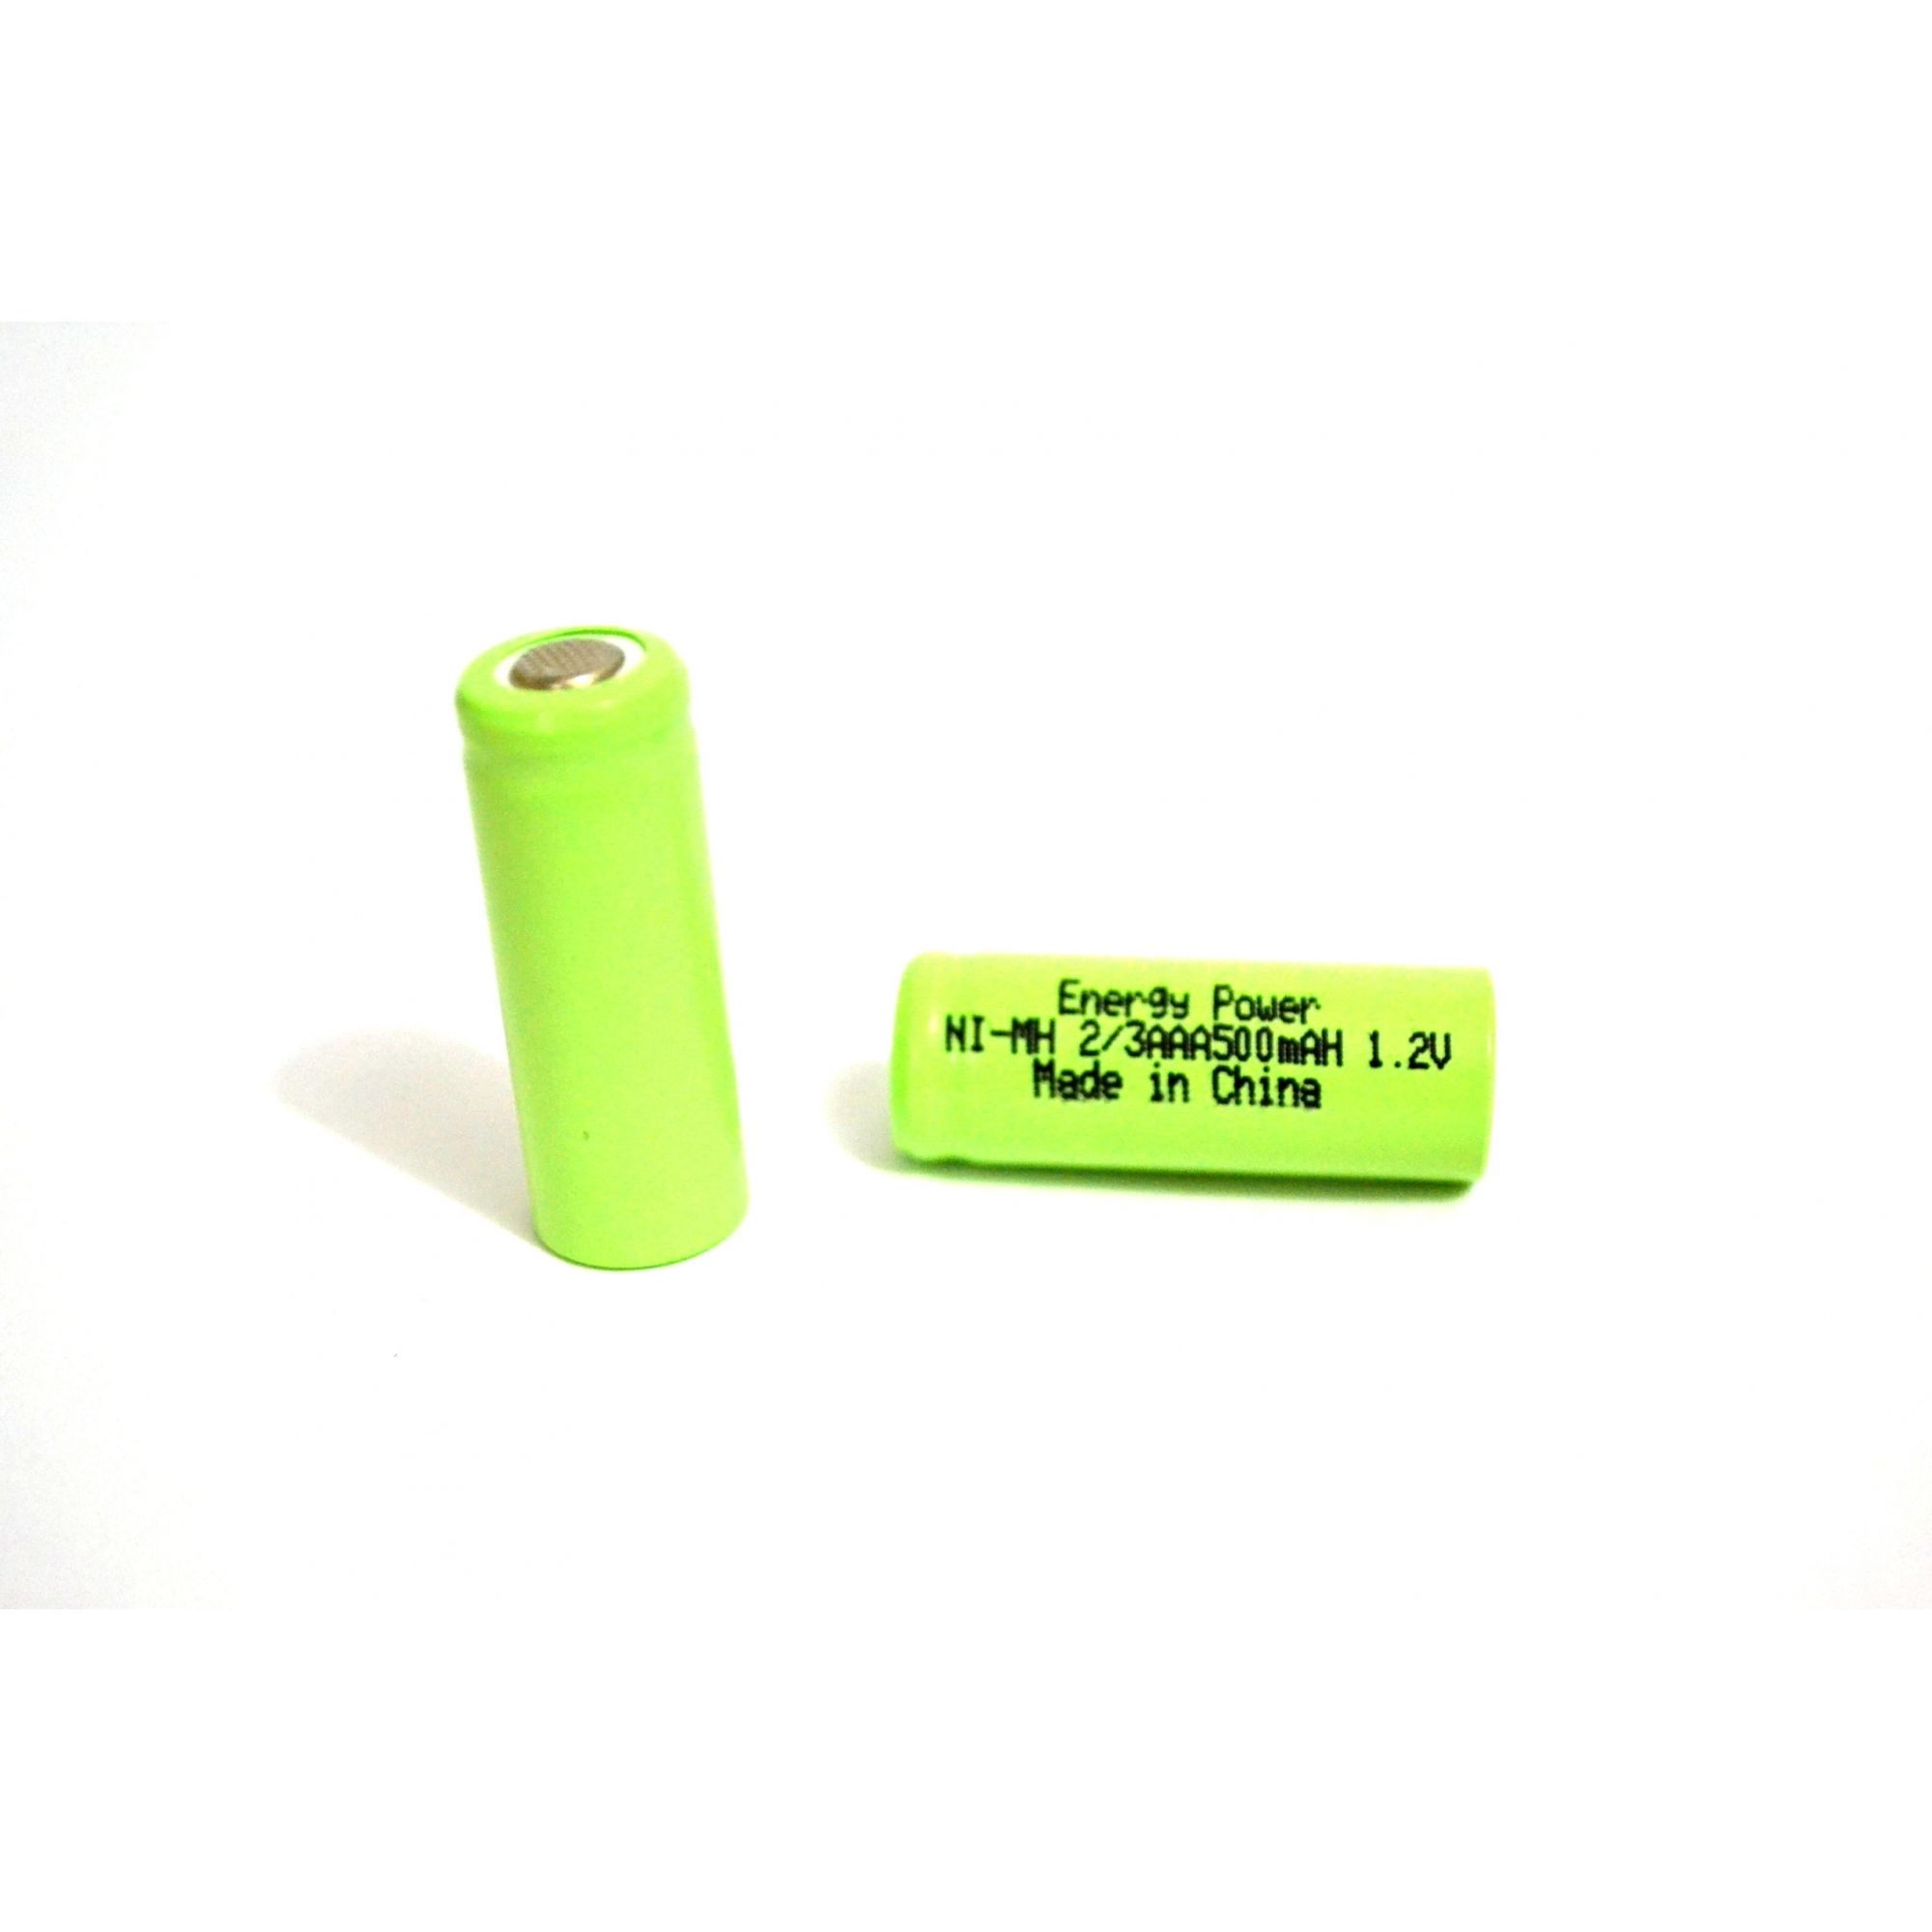 BATERIA ENERGY POWER 2/3AAA 500MAH 1,2V NI-MH